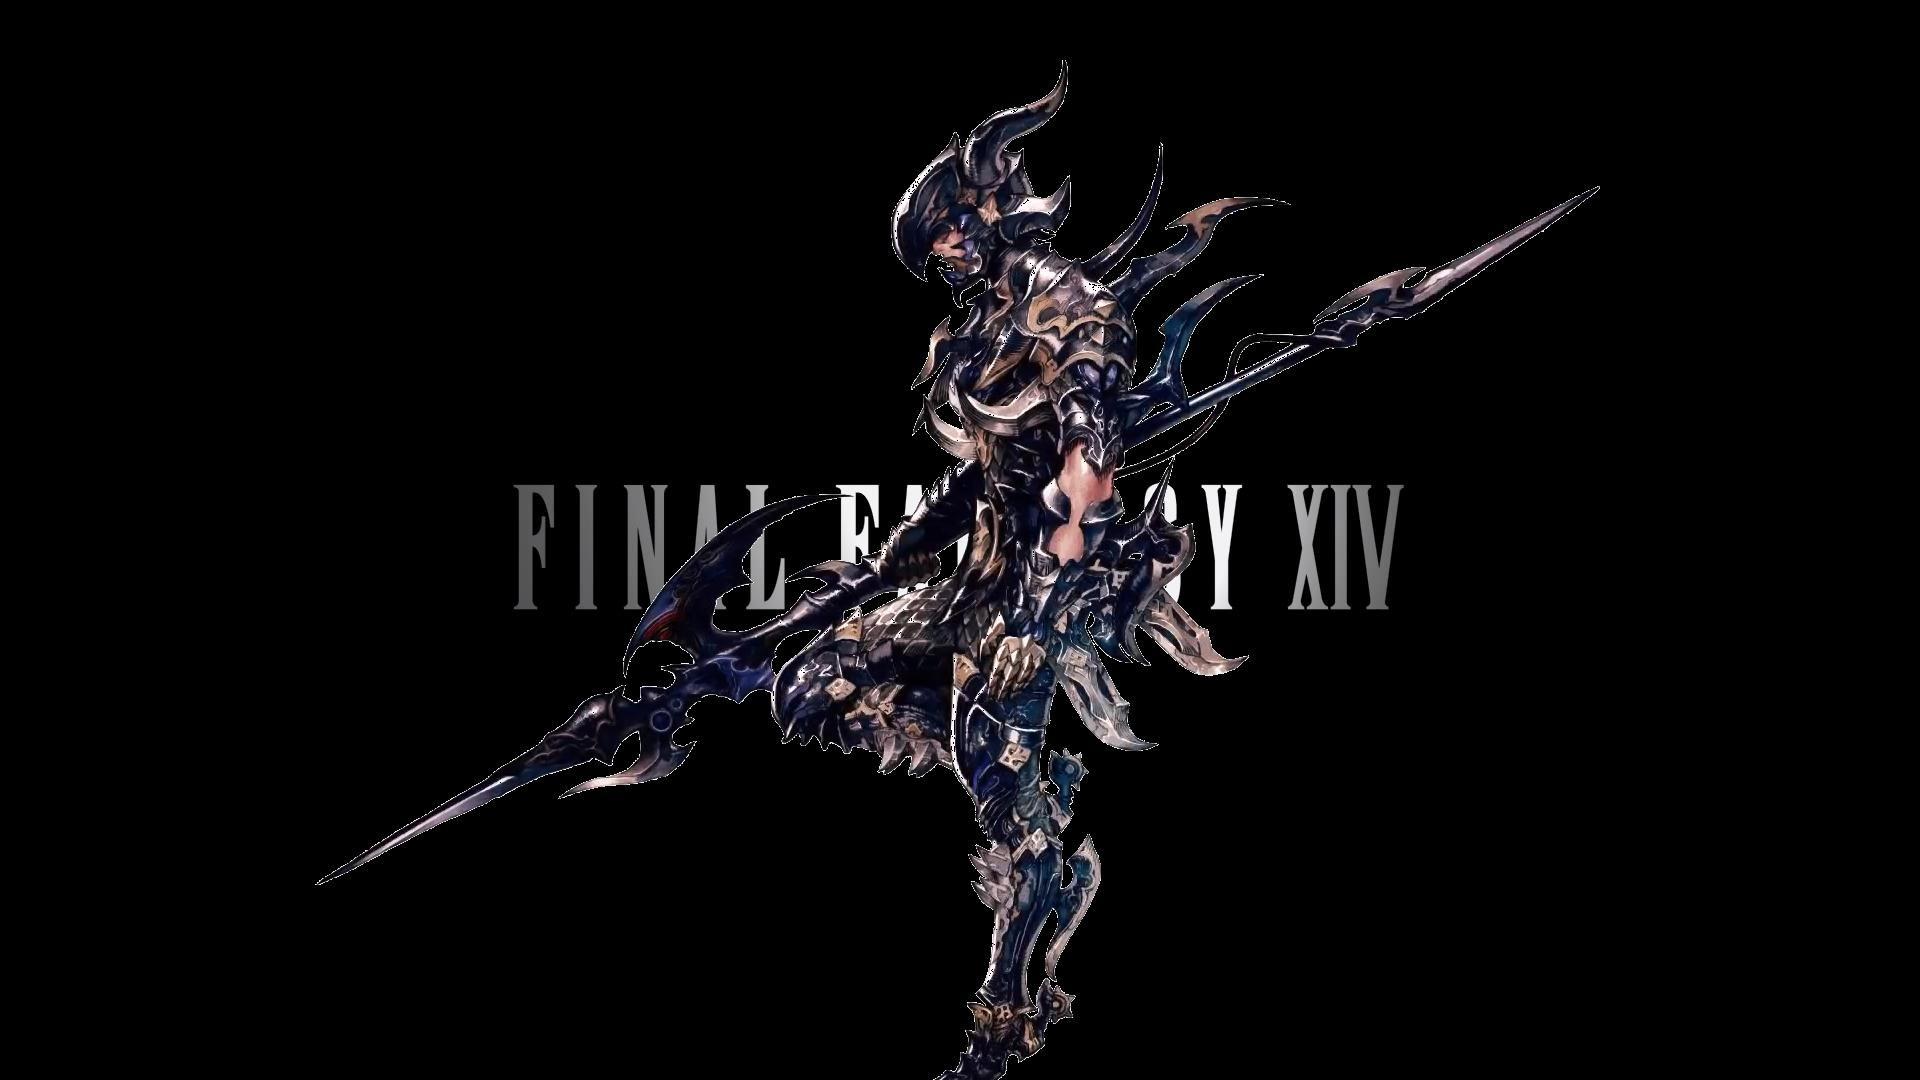 Final Fantasy XIV free wallpapers